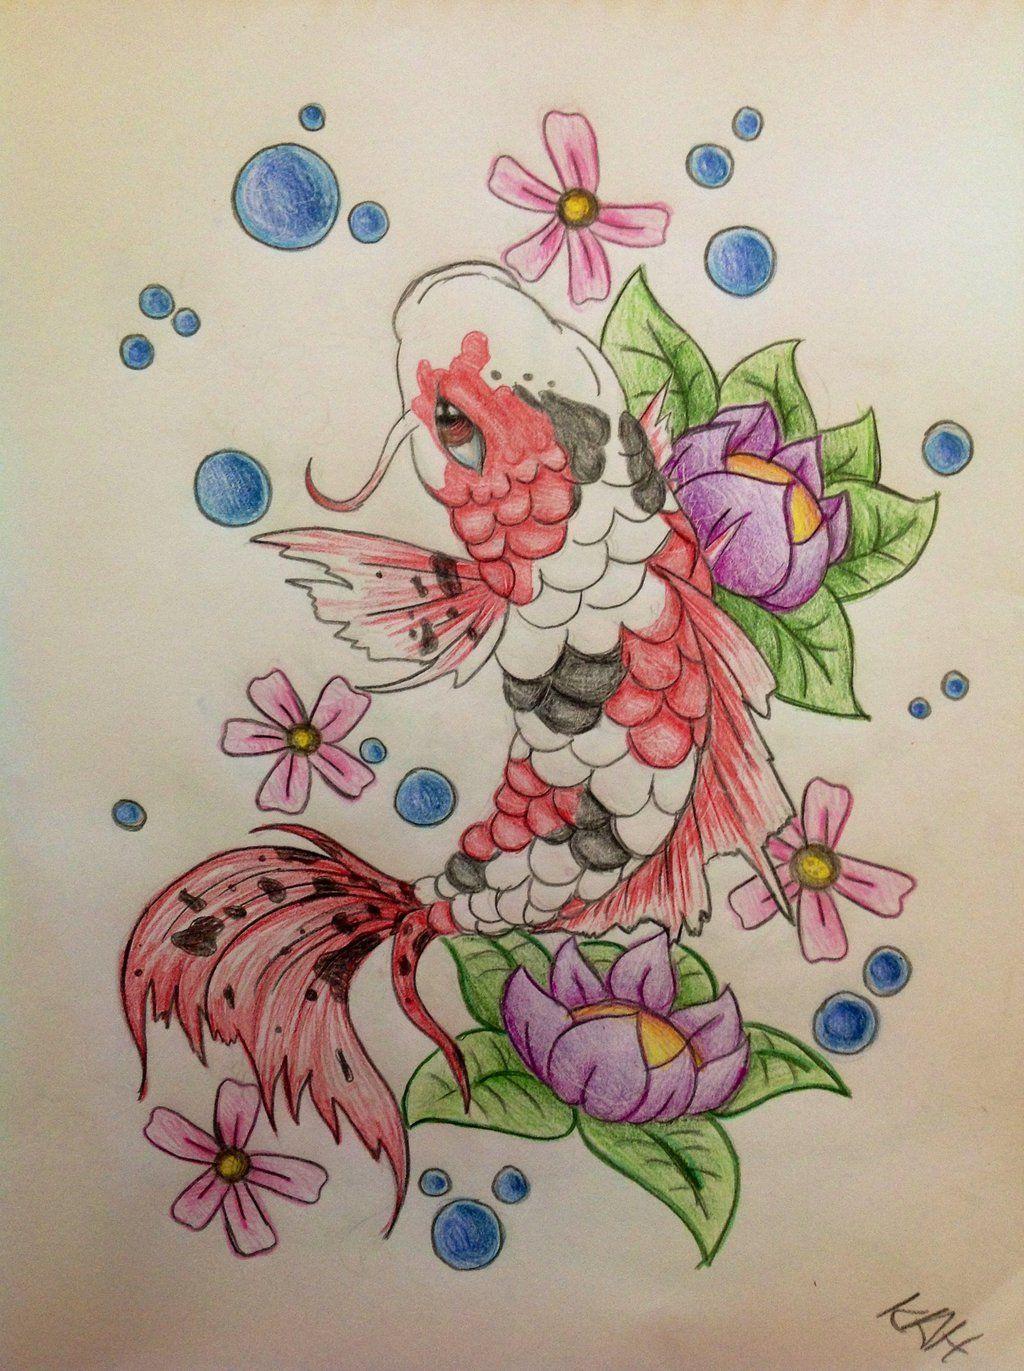 koi fish tattoos on hip Beautiful Koi Fish Drawings Koi